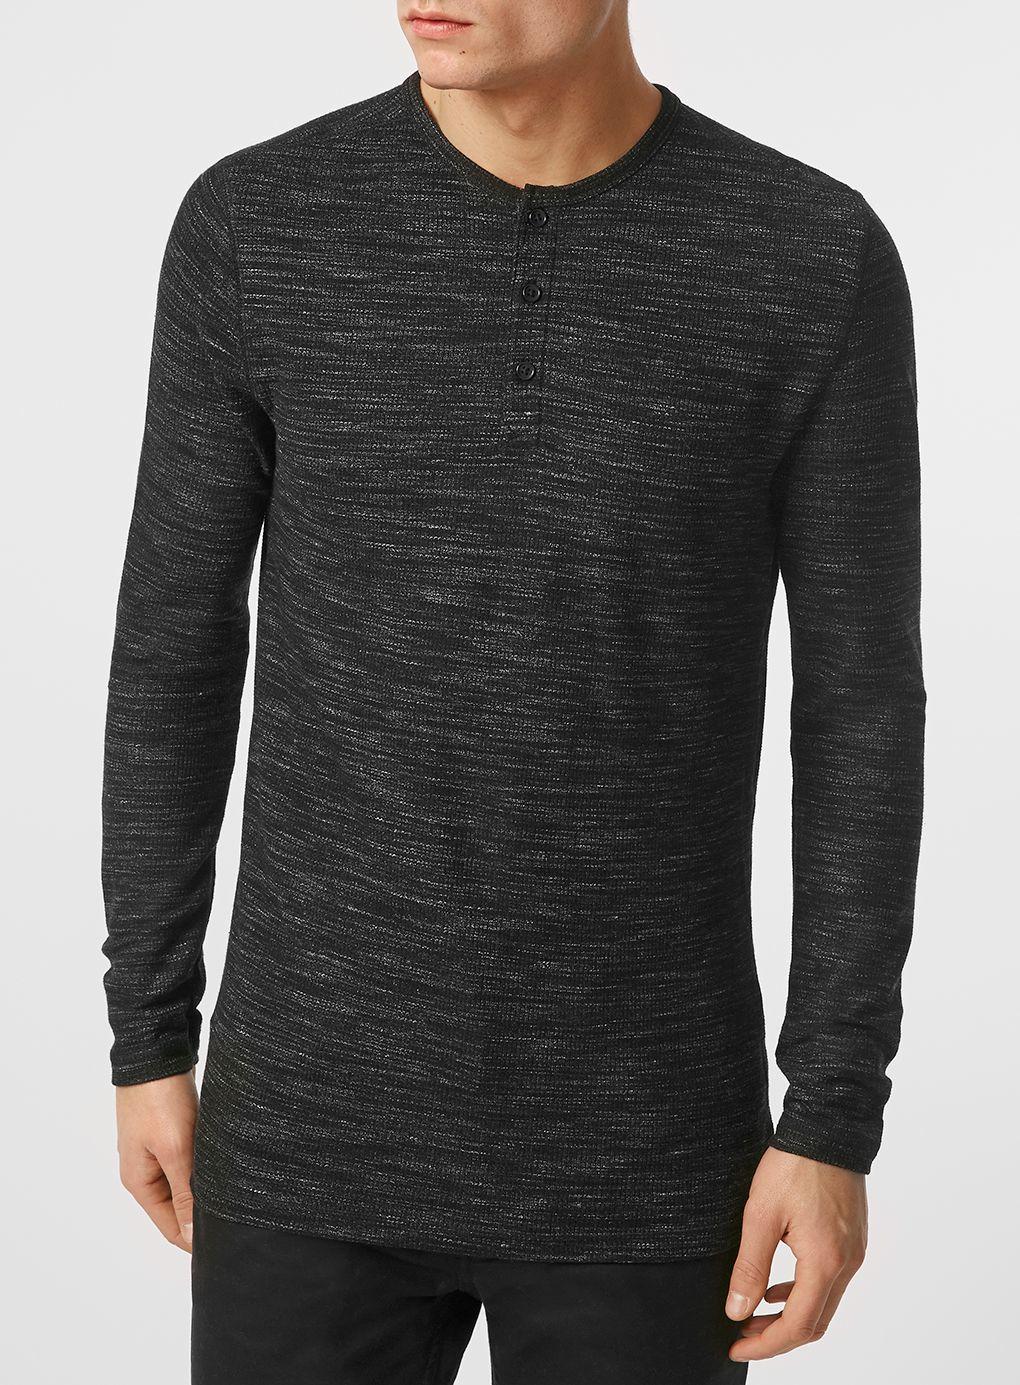 Black t shirt topman - Gallery